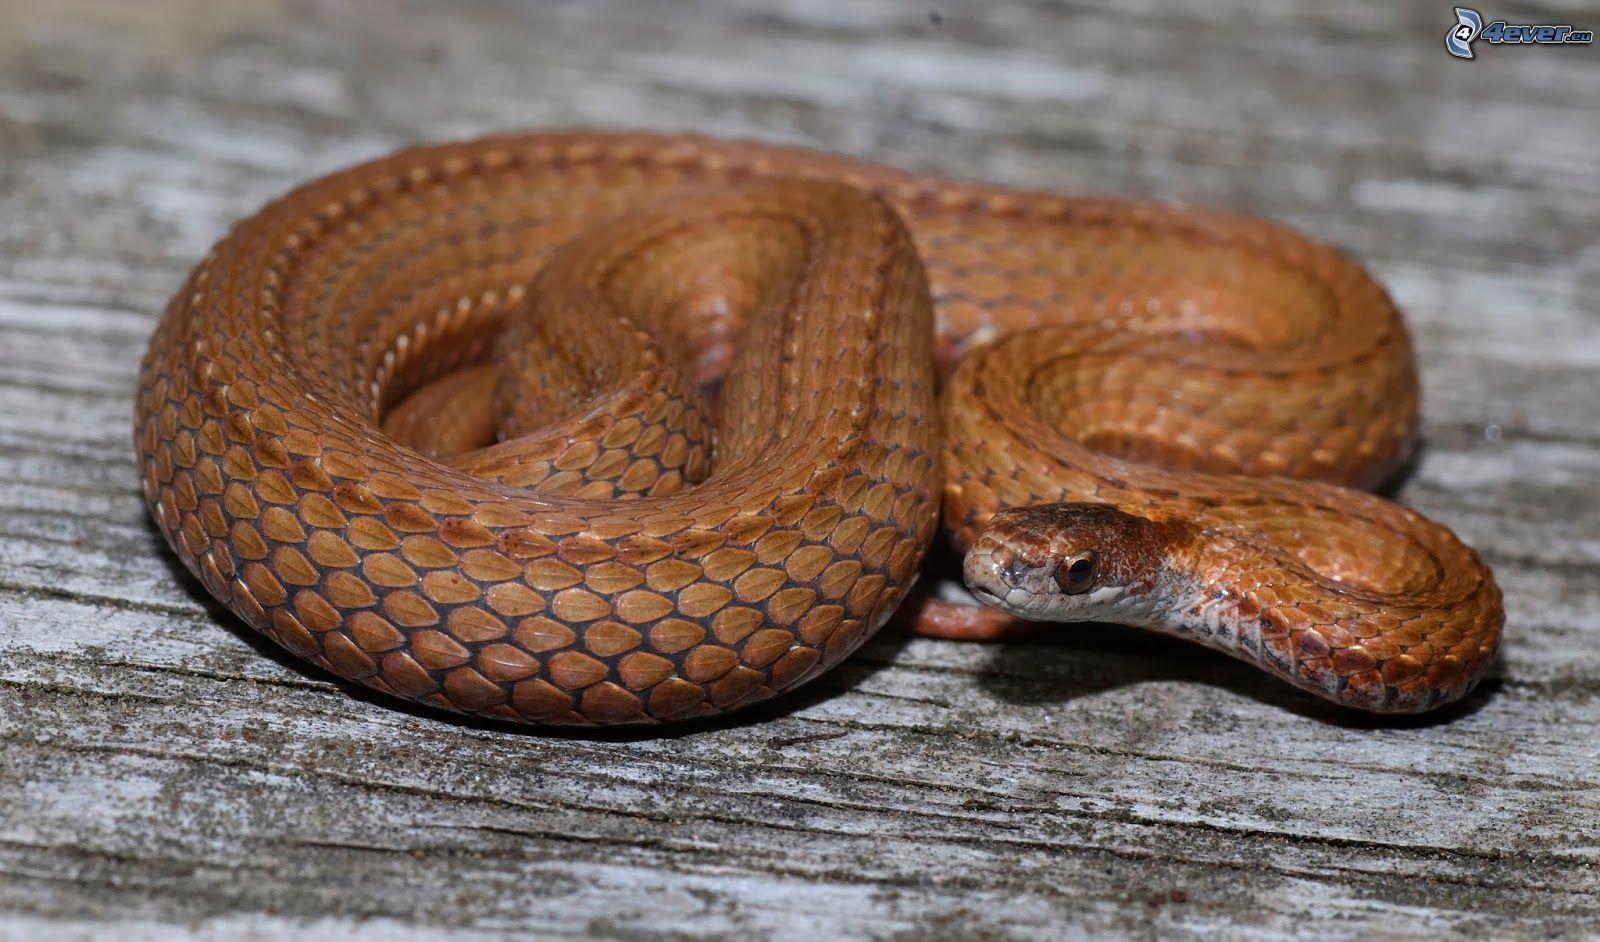 hawaii brown snakes - HD1600×942